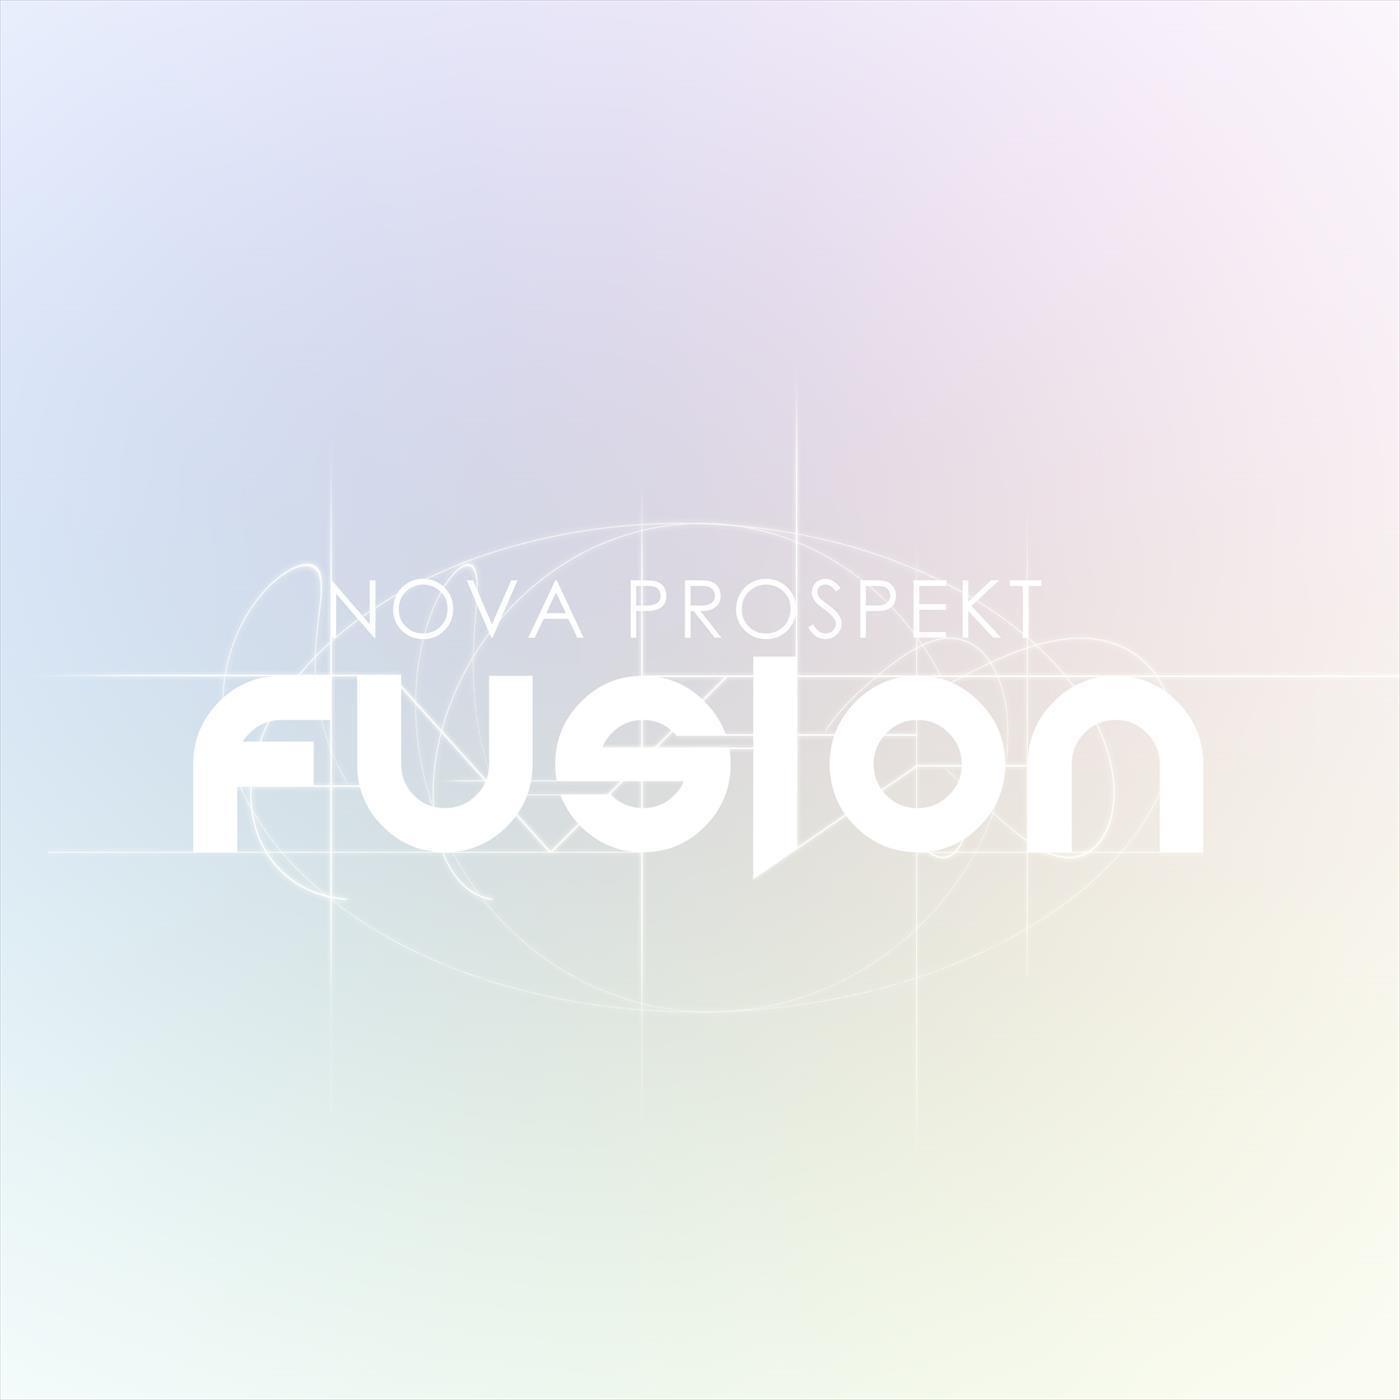 Nova Prospekt - Fusion [single] (2013)